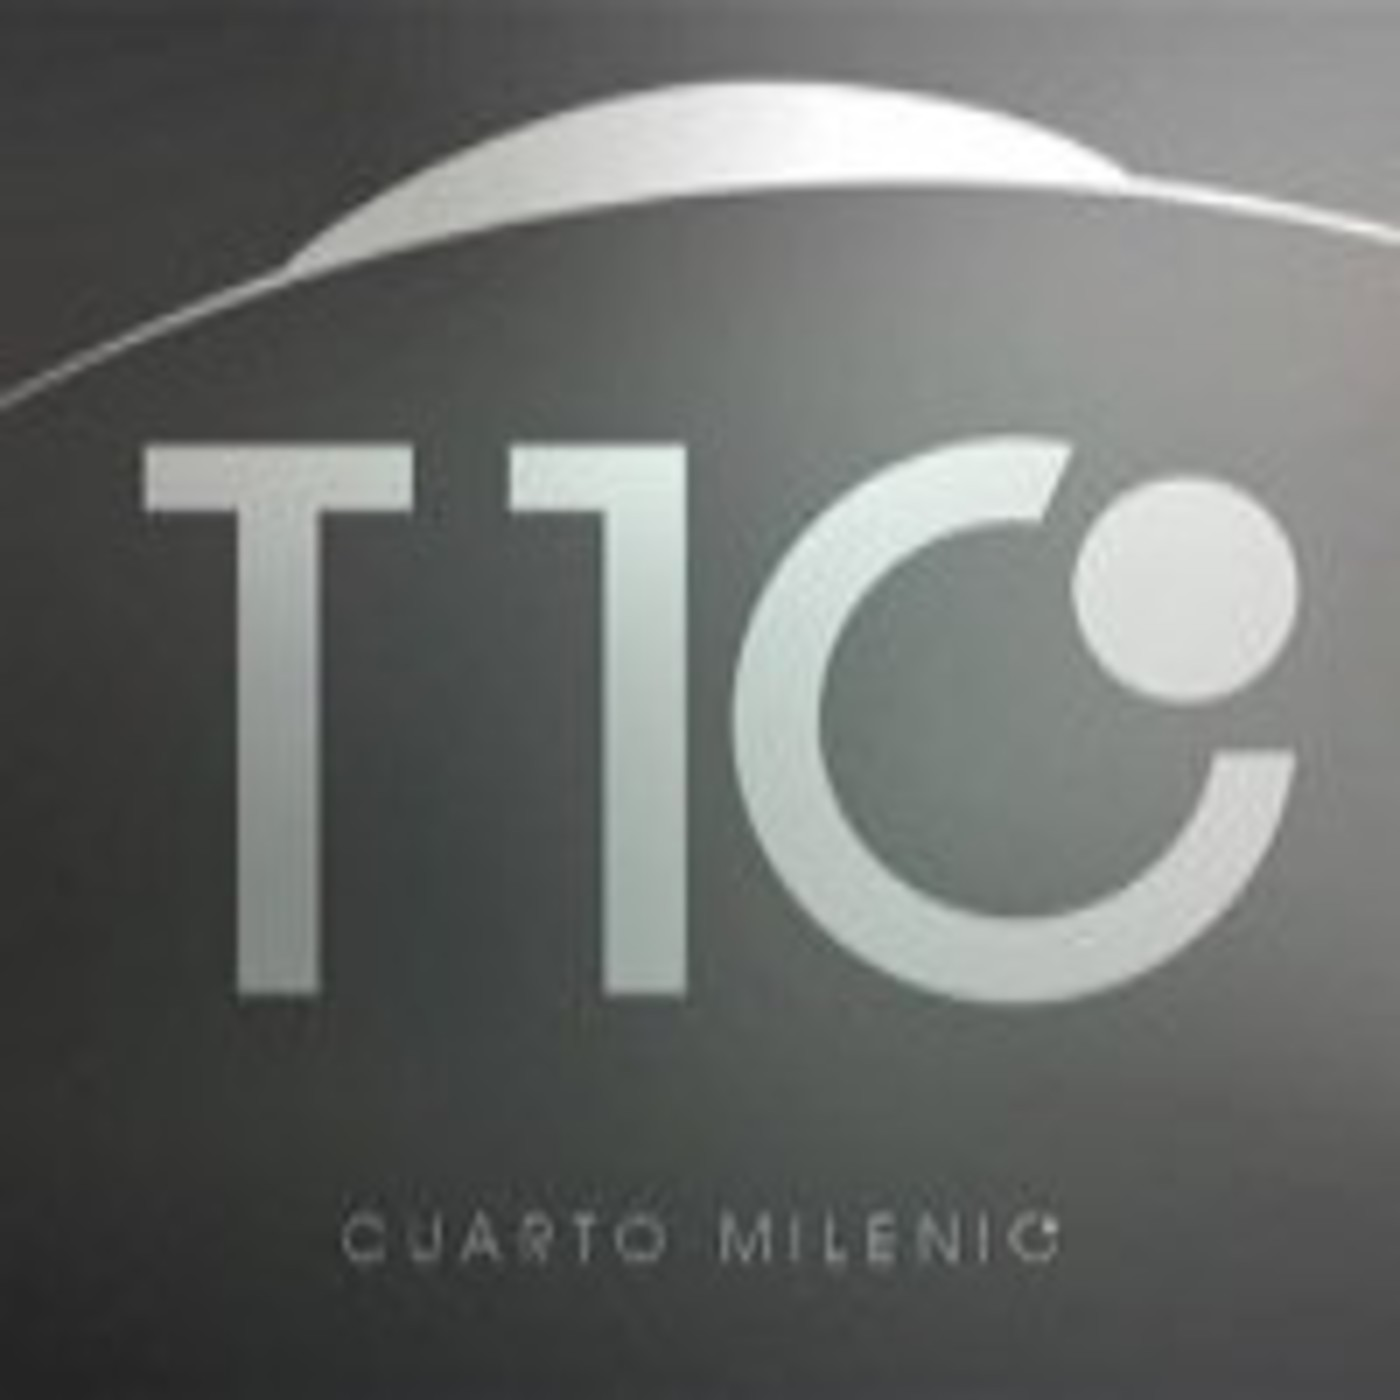 Cuarto milenio 7 9 2014 10x01 operaci n b lmez la for Cuarto milenio radio horario